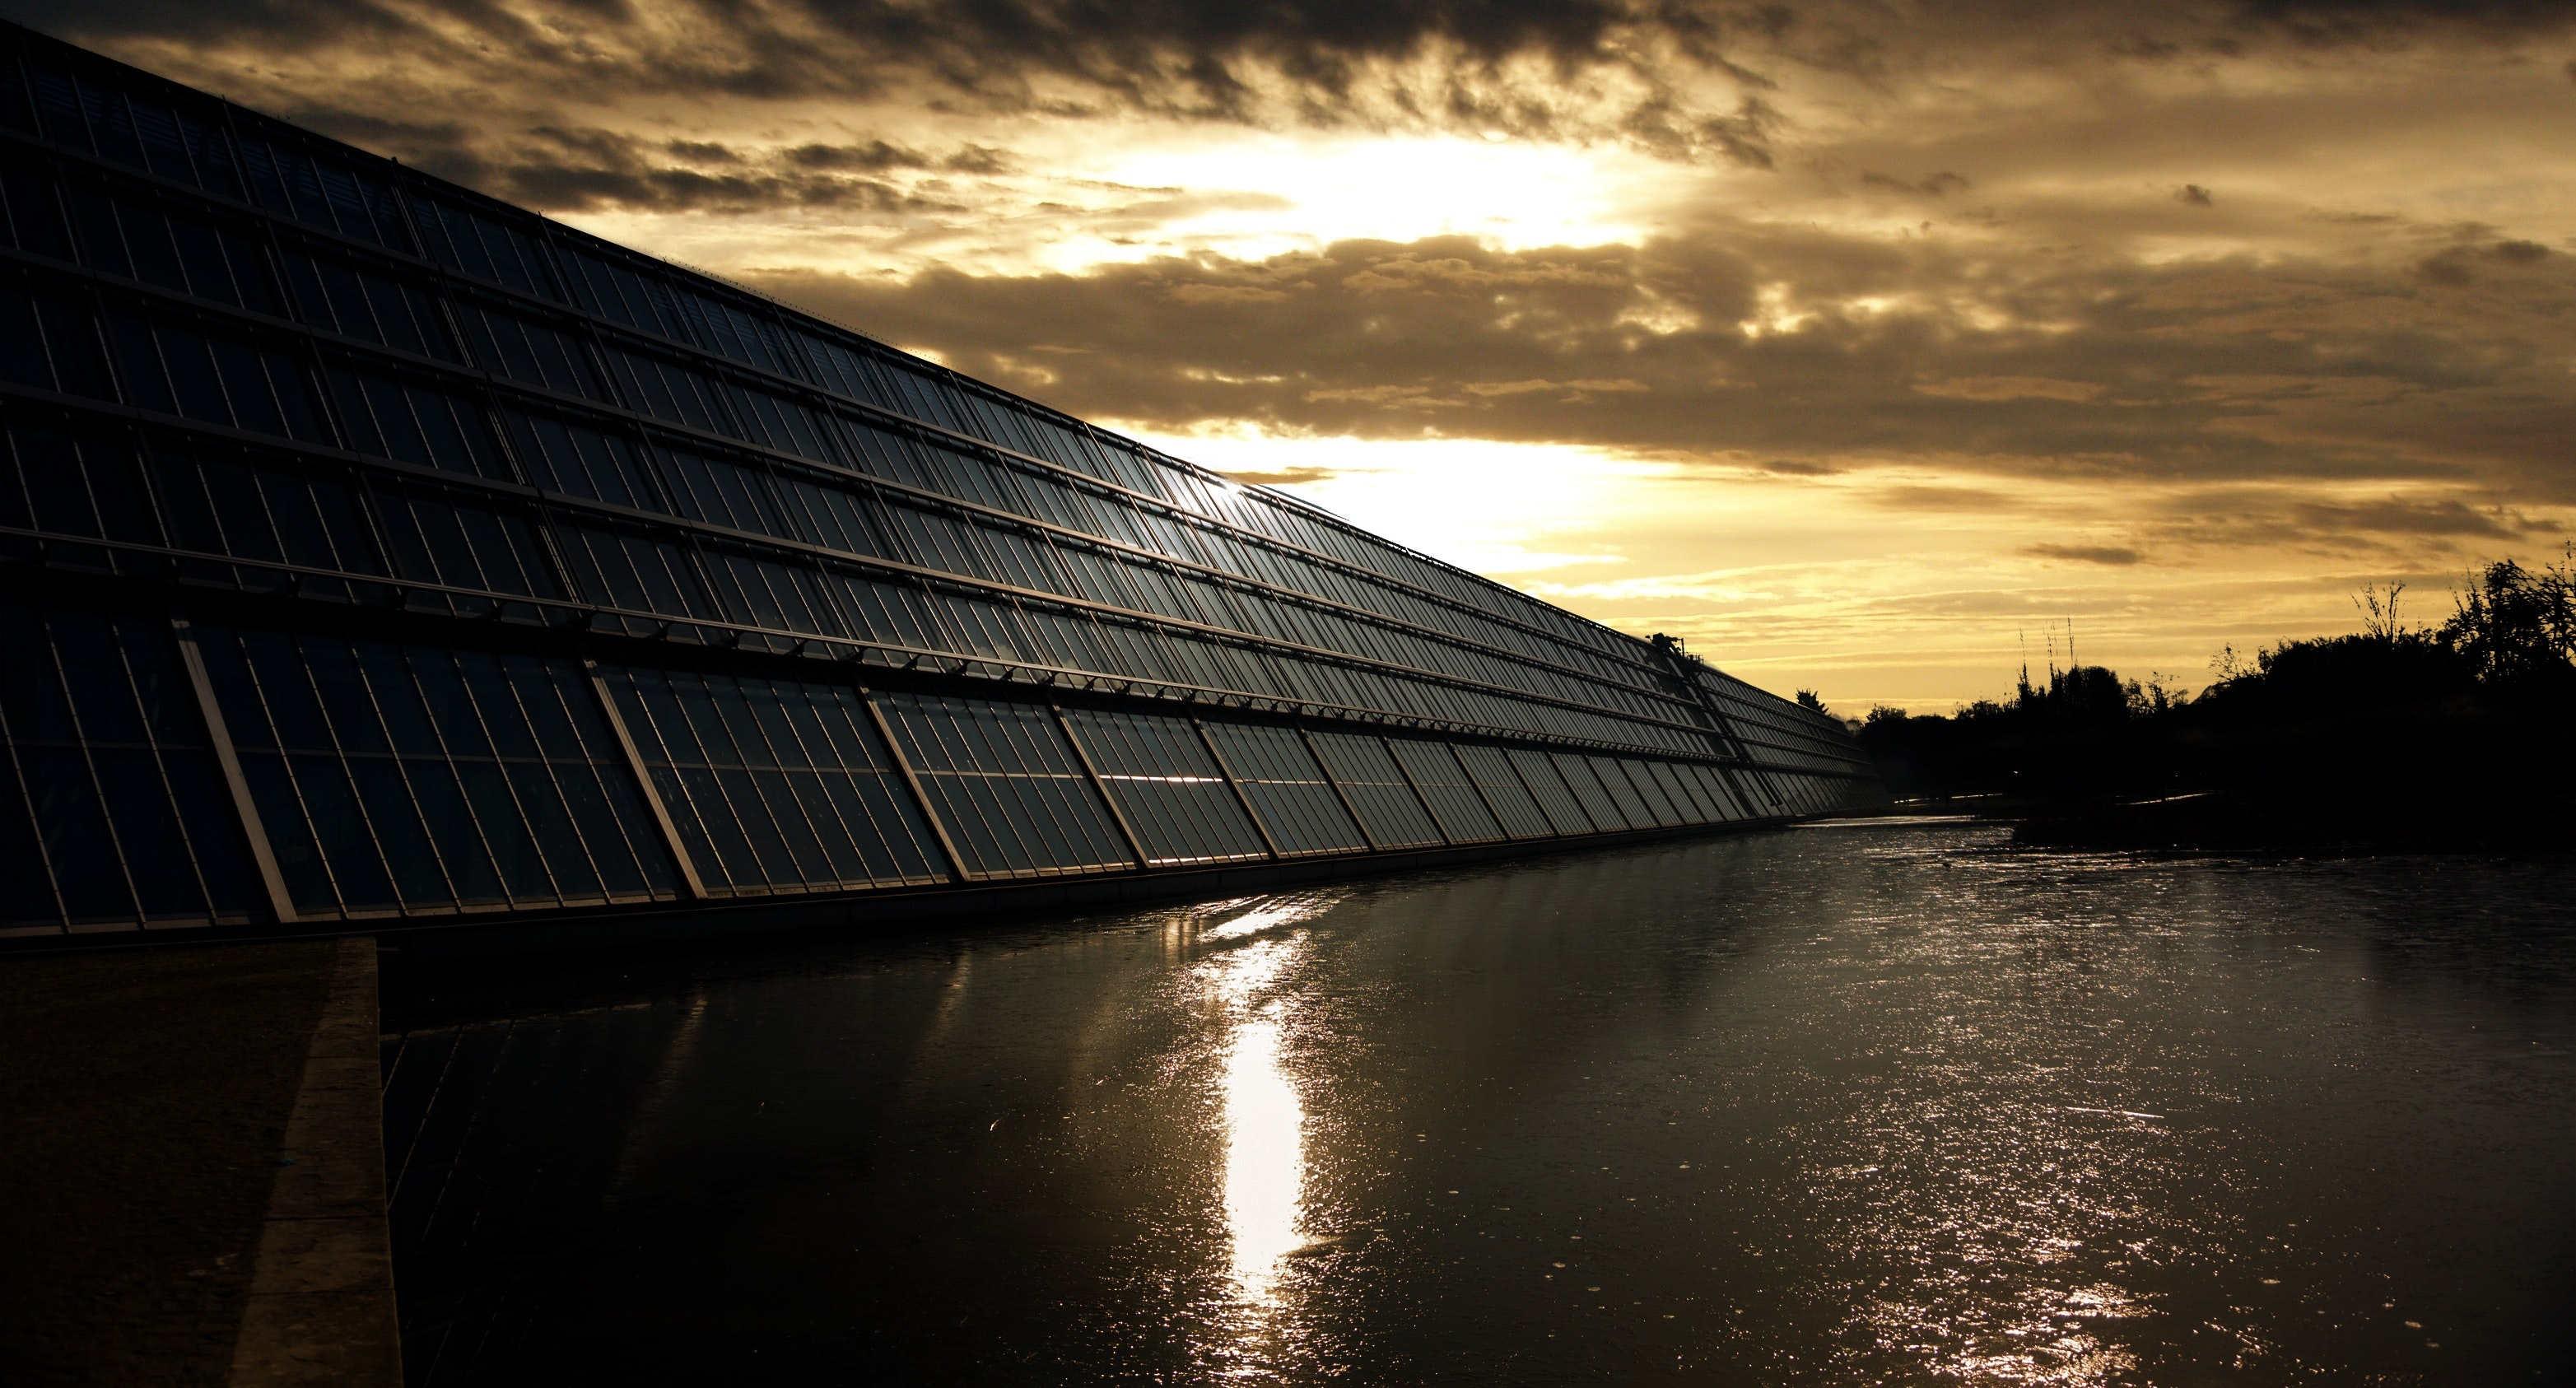 Gruppo Aura Impianto Fotovoltaico Rimini